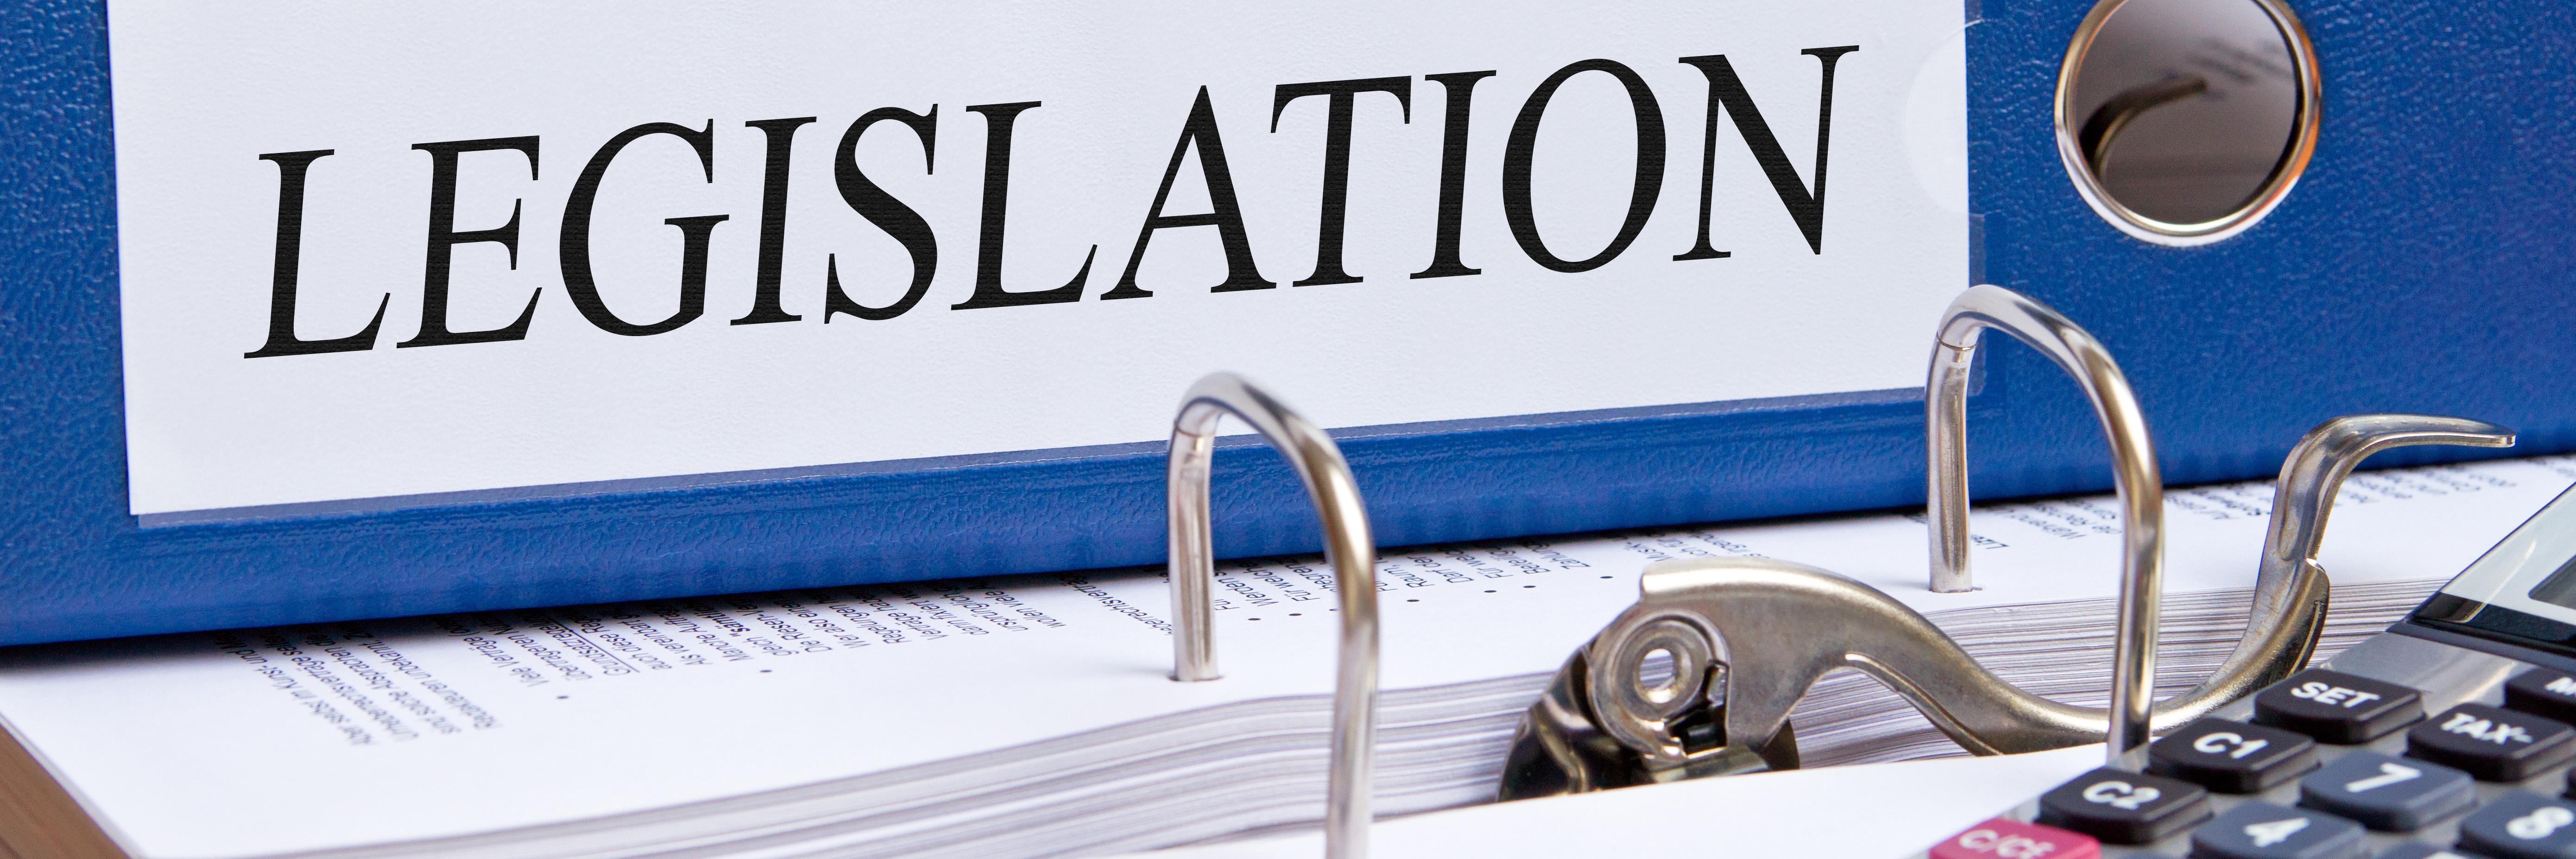 PenTec_Feed Additives legislation_REFIT